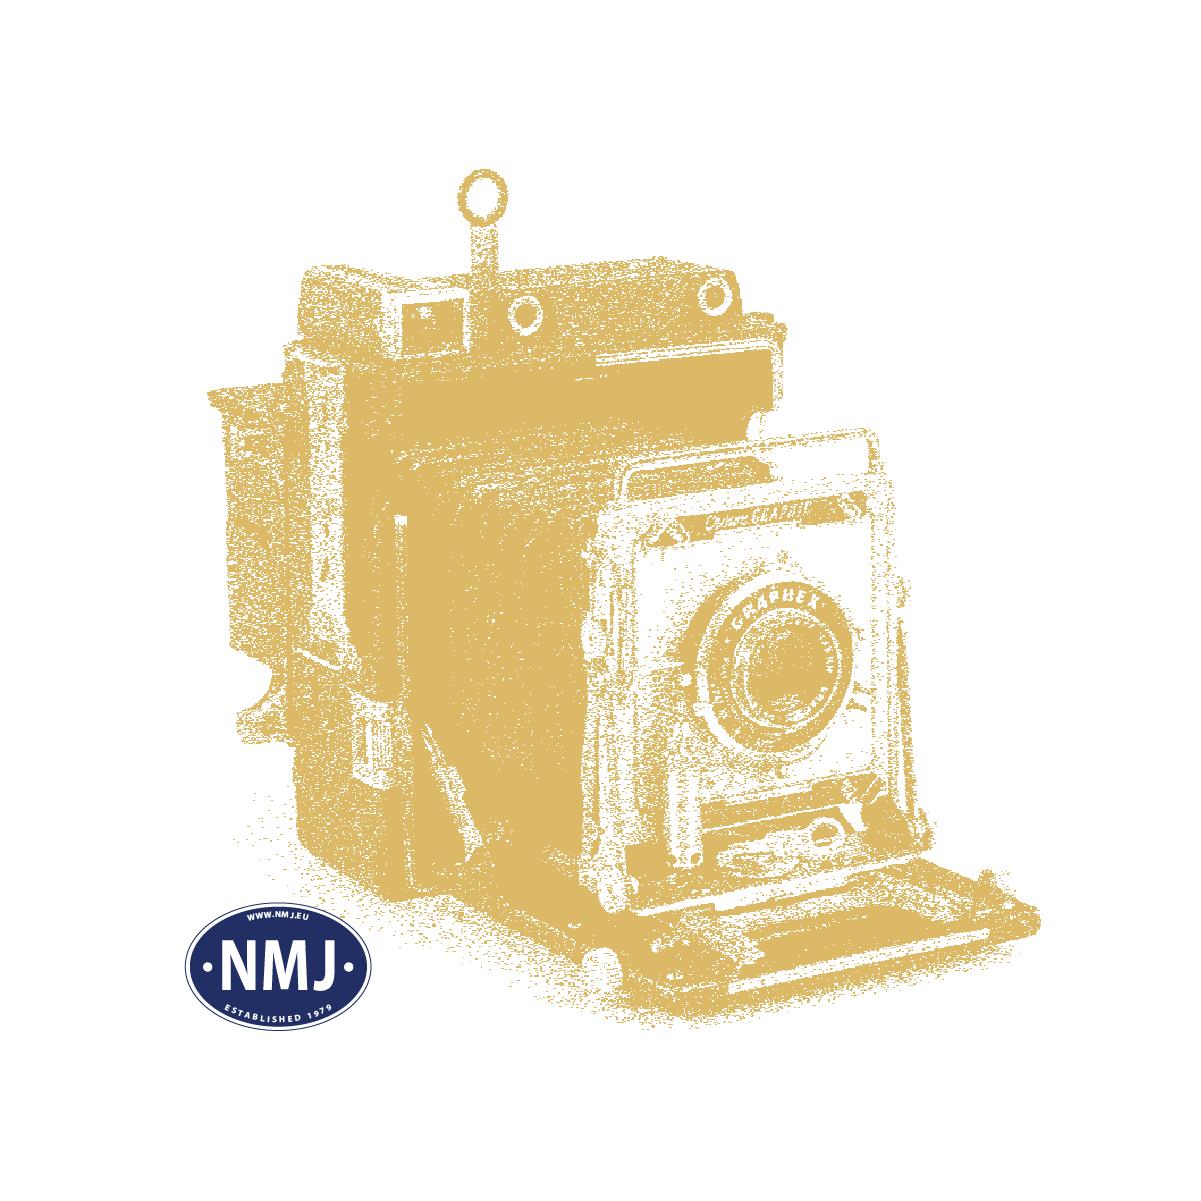 NMJT131.102 - NMJ Topline NSB B3 25502 type 3, Gammeldesign